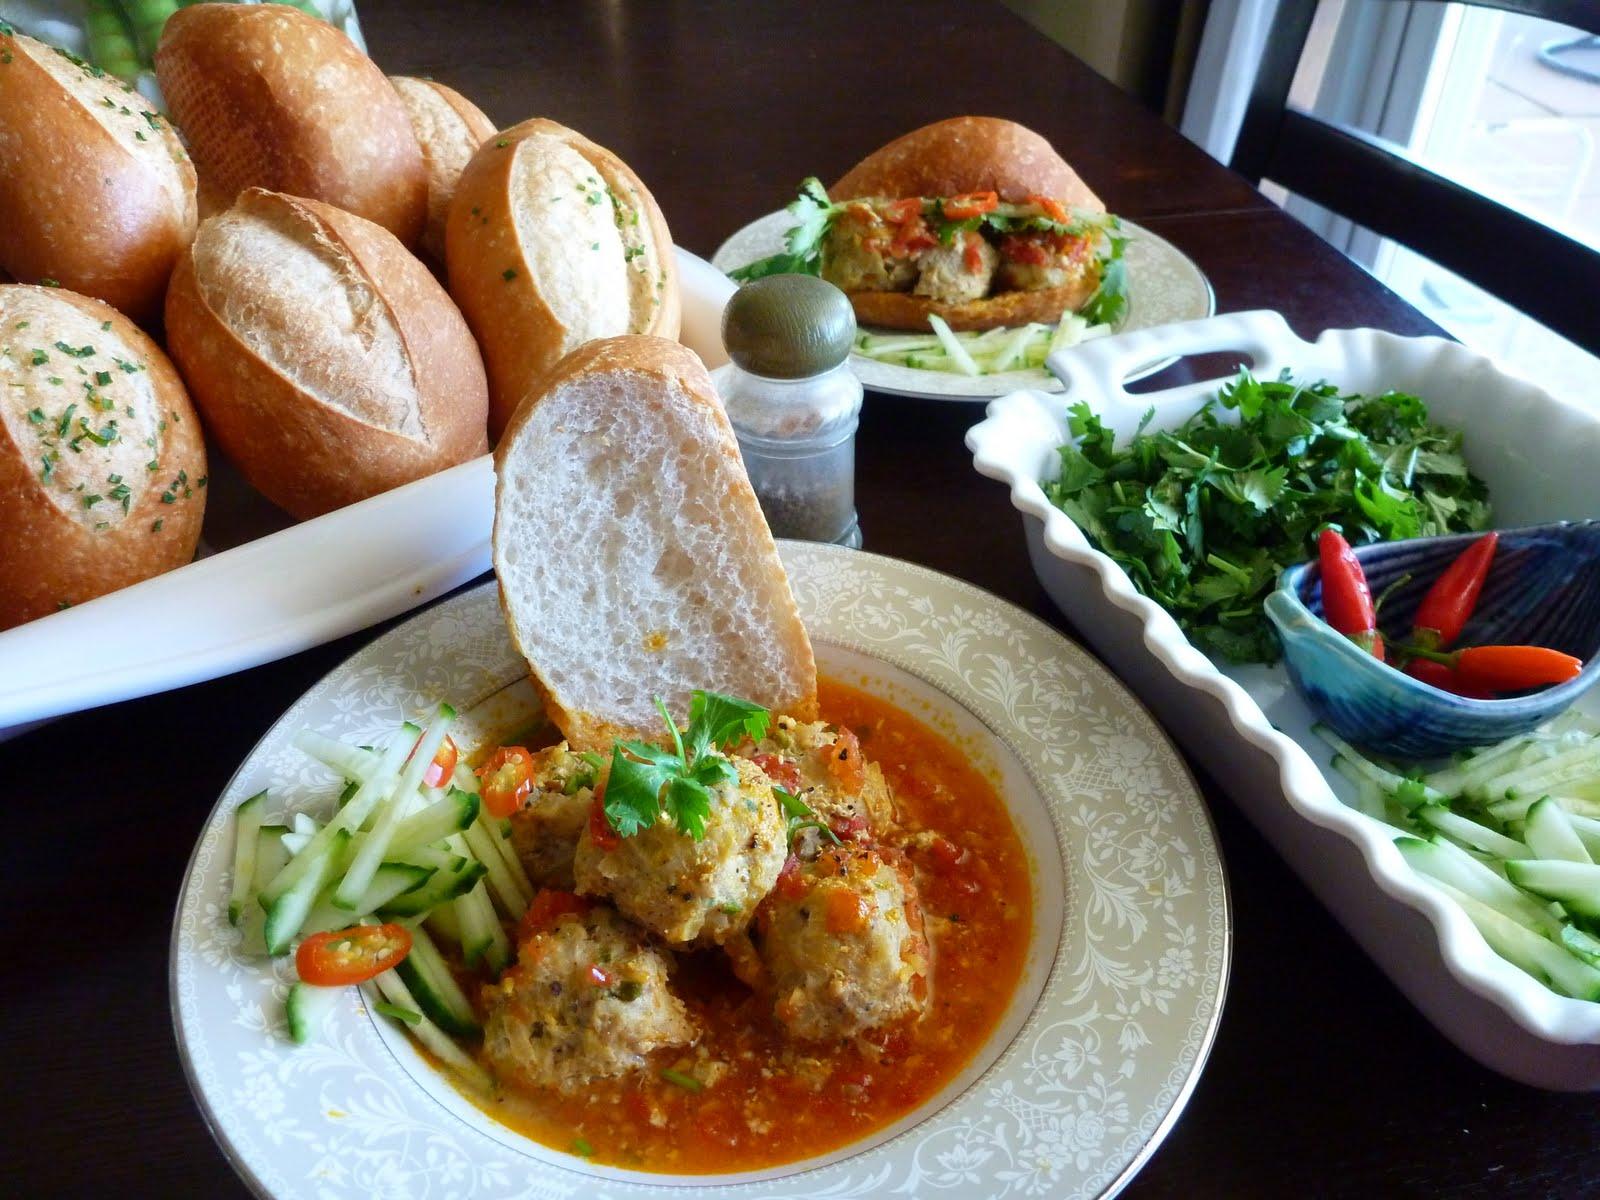 Banh Mi Xiu Mai (Vietnamese Baguette with Meatball Soup)